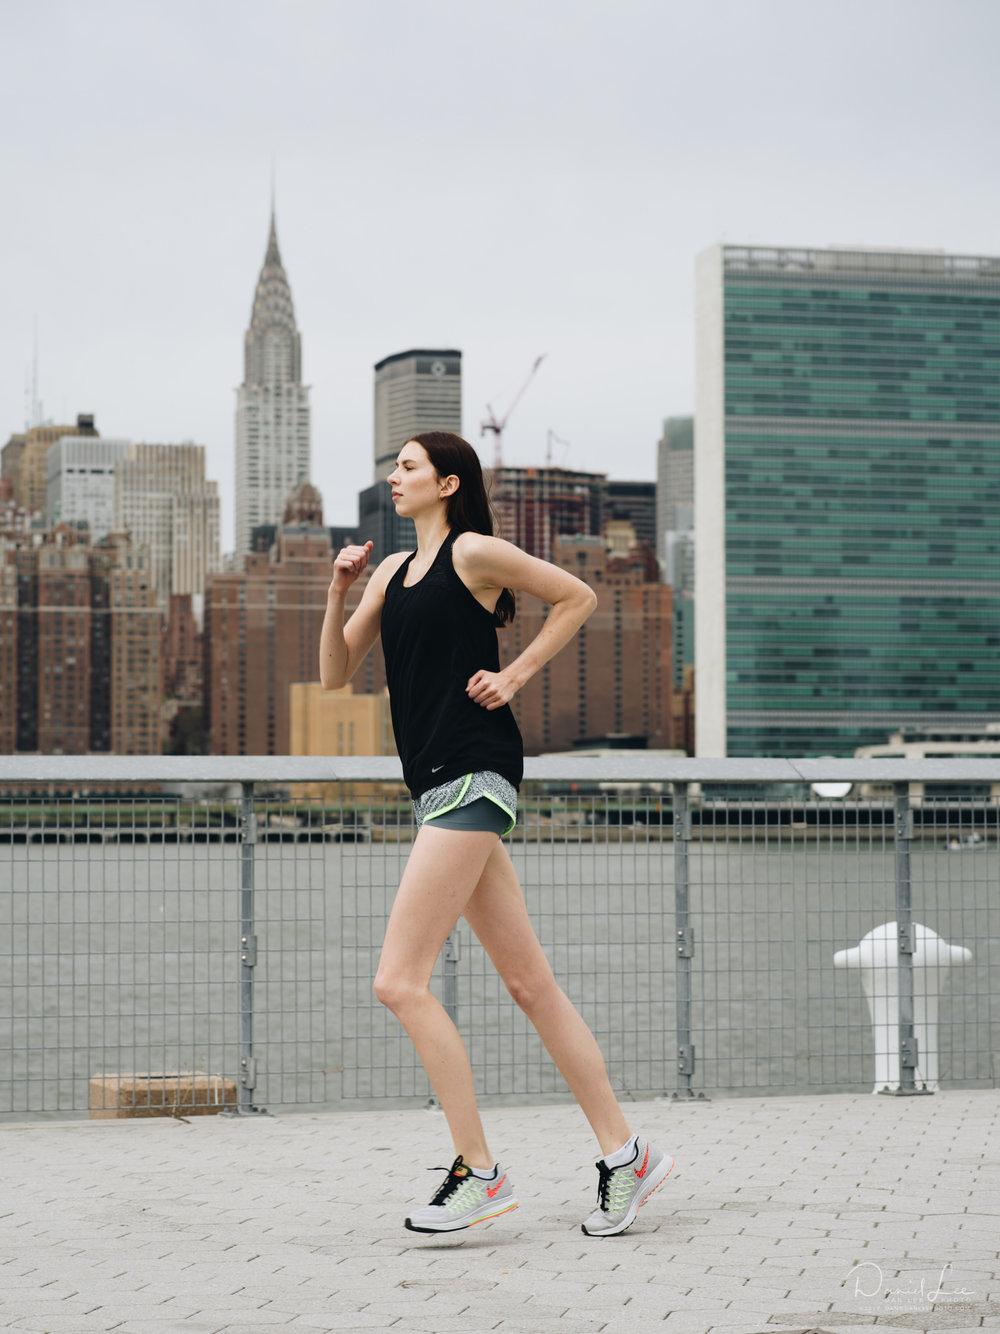 Ana Tess, Model. Photo by Daniel Lee.